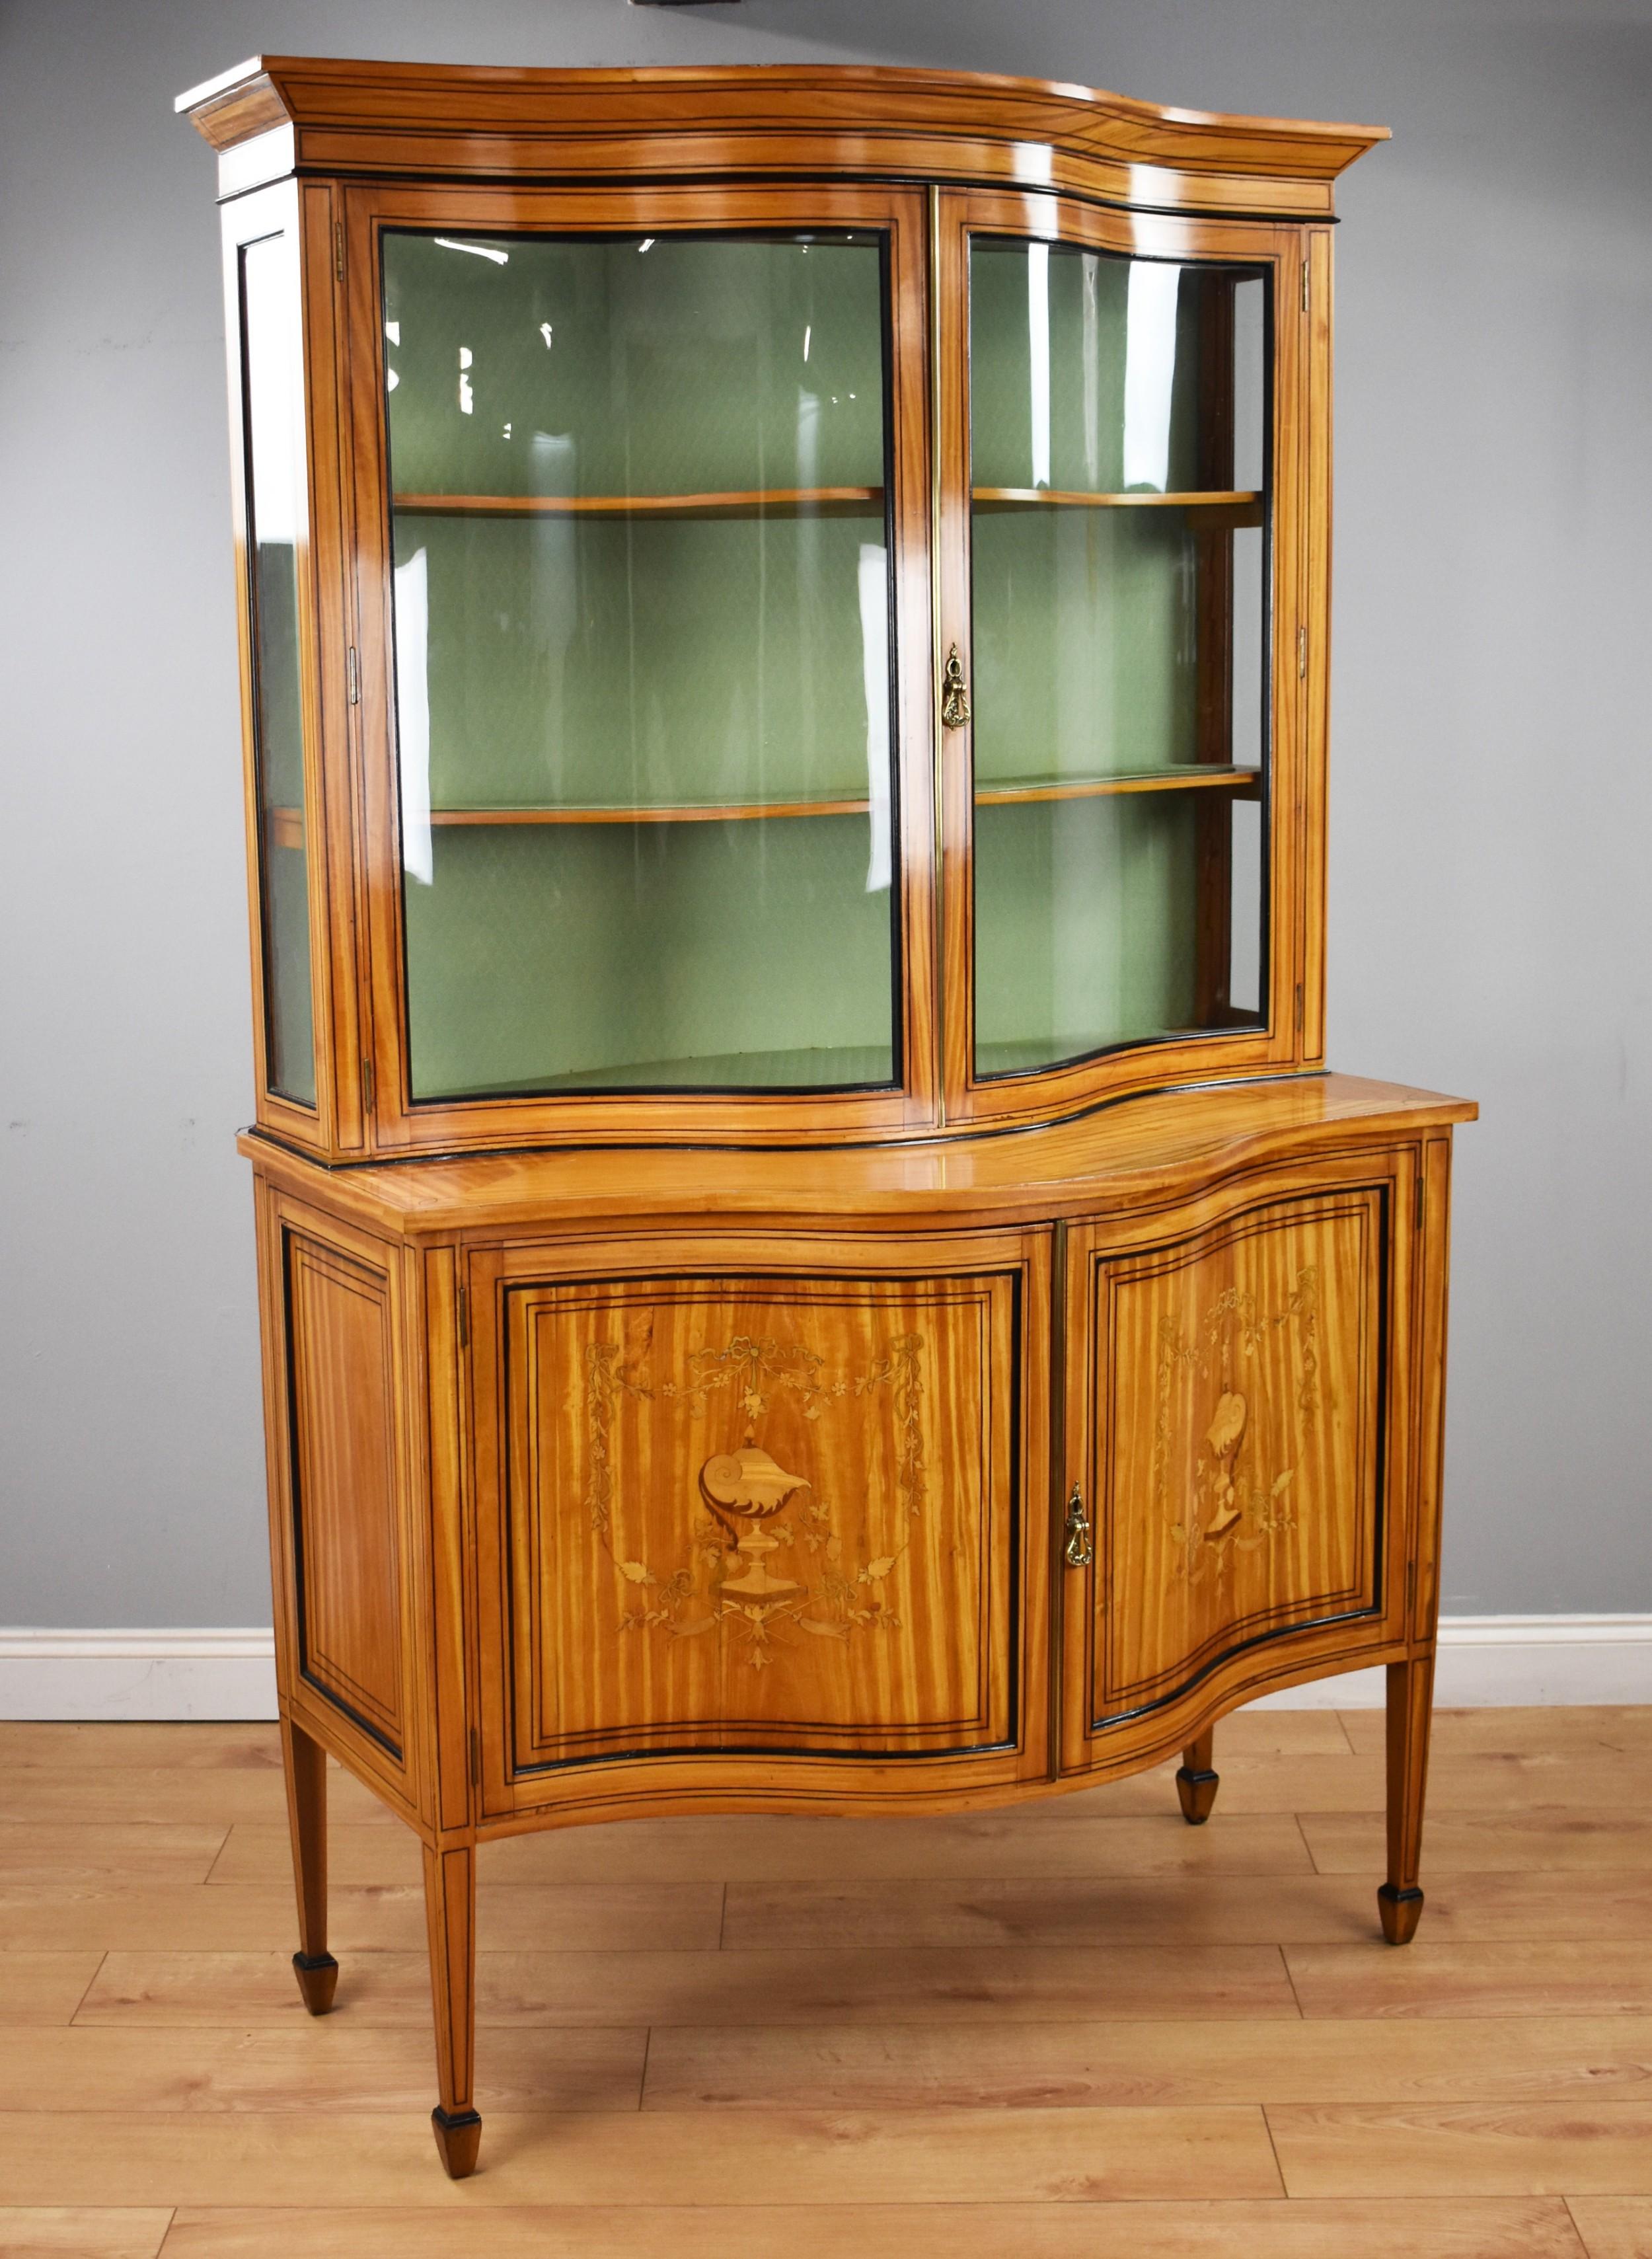 19th century satinwood serpentine display cabinet